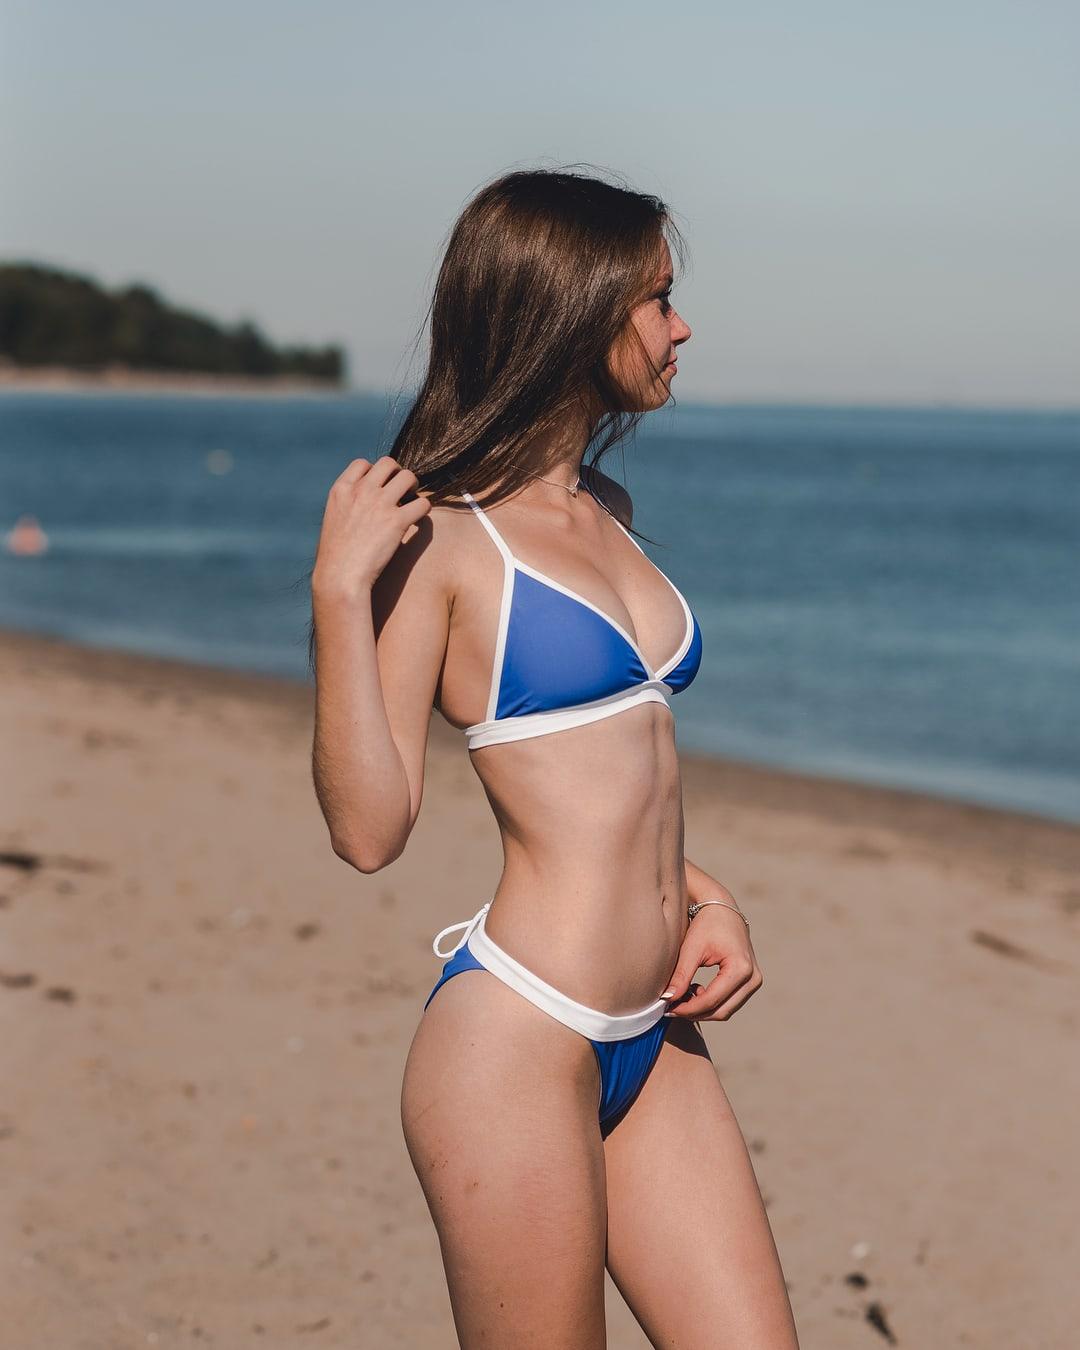 Bikini Ana Alexander nude (27 photo), Topless, Paparazzi, Selfie, lingerie 2019